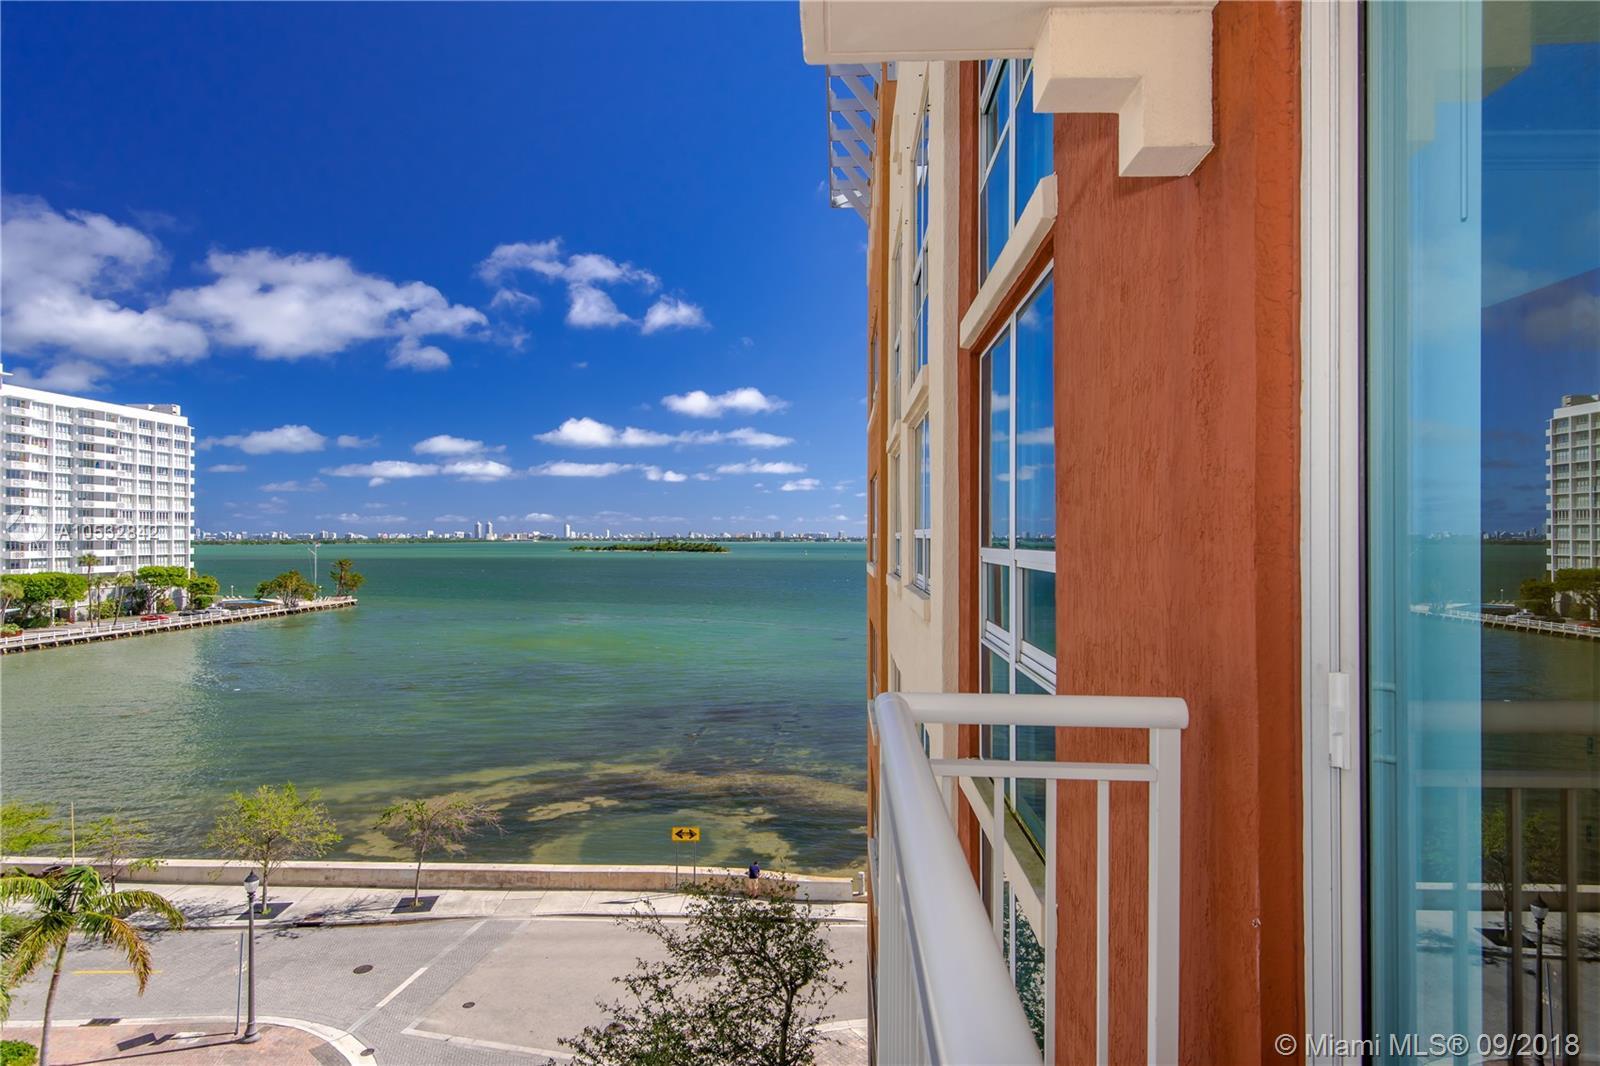 2000 N Bayshore Dr # 522, Miami, Florida 33137, 2 Bedrooms Bedrooms, ,2 BathroomsBathrooms,Residential,For Sale,2000 N Bayshore Dr # 522,A10532842